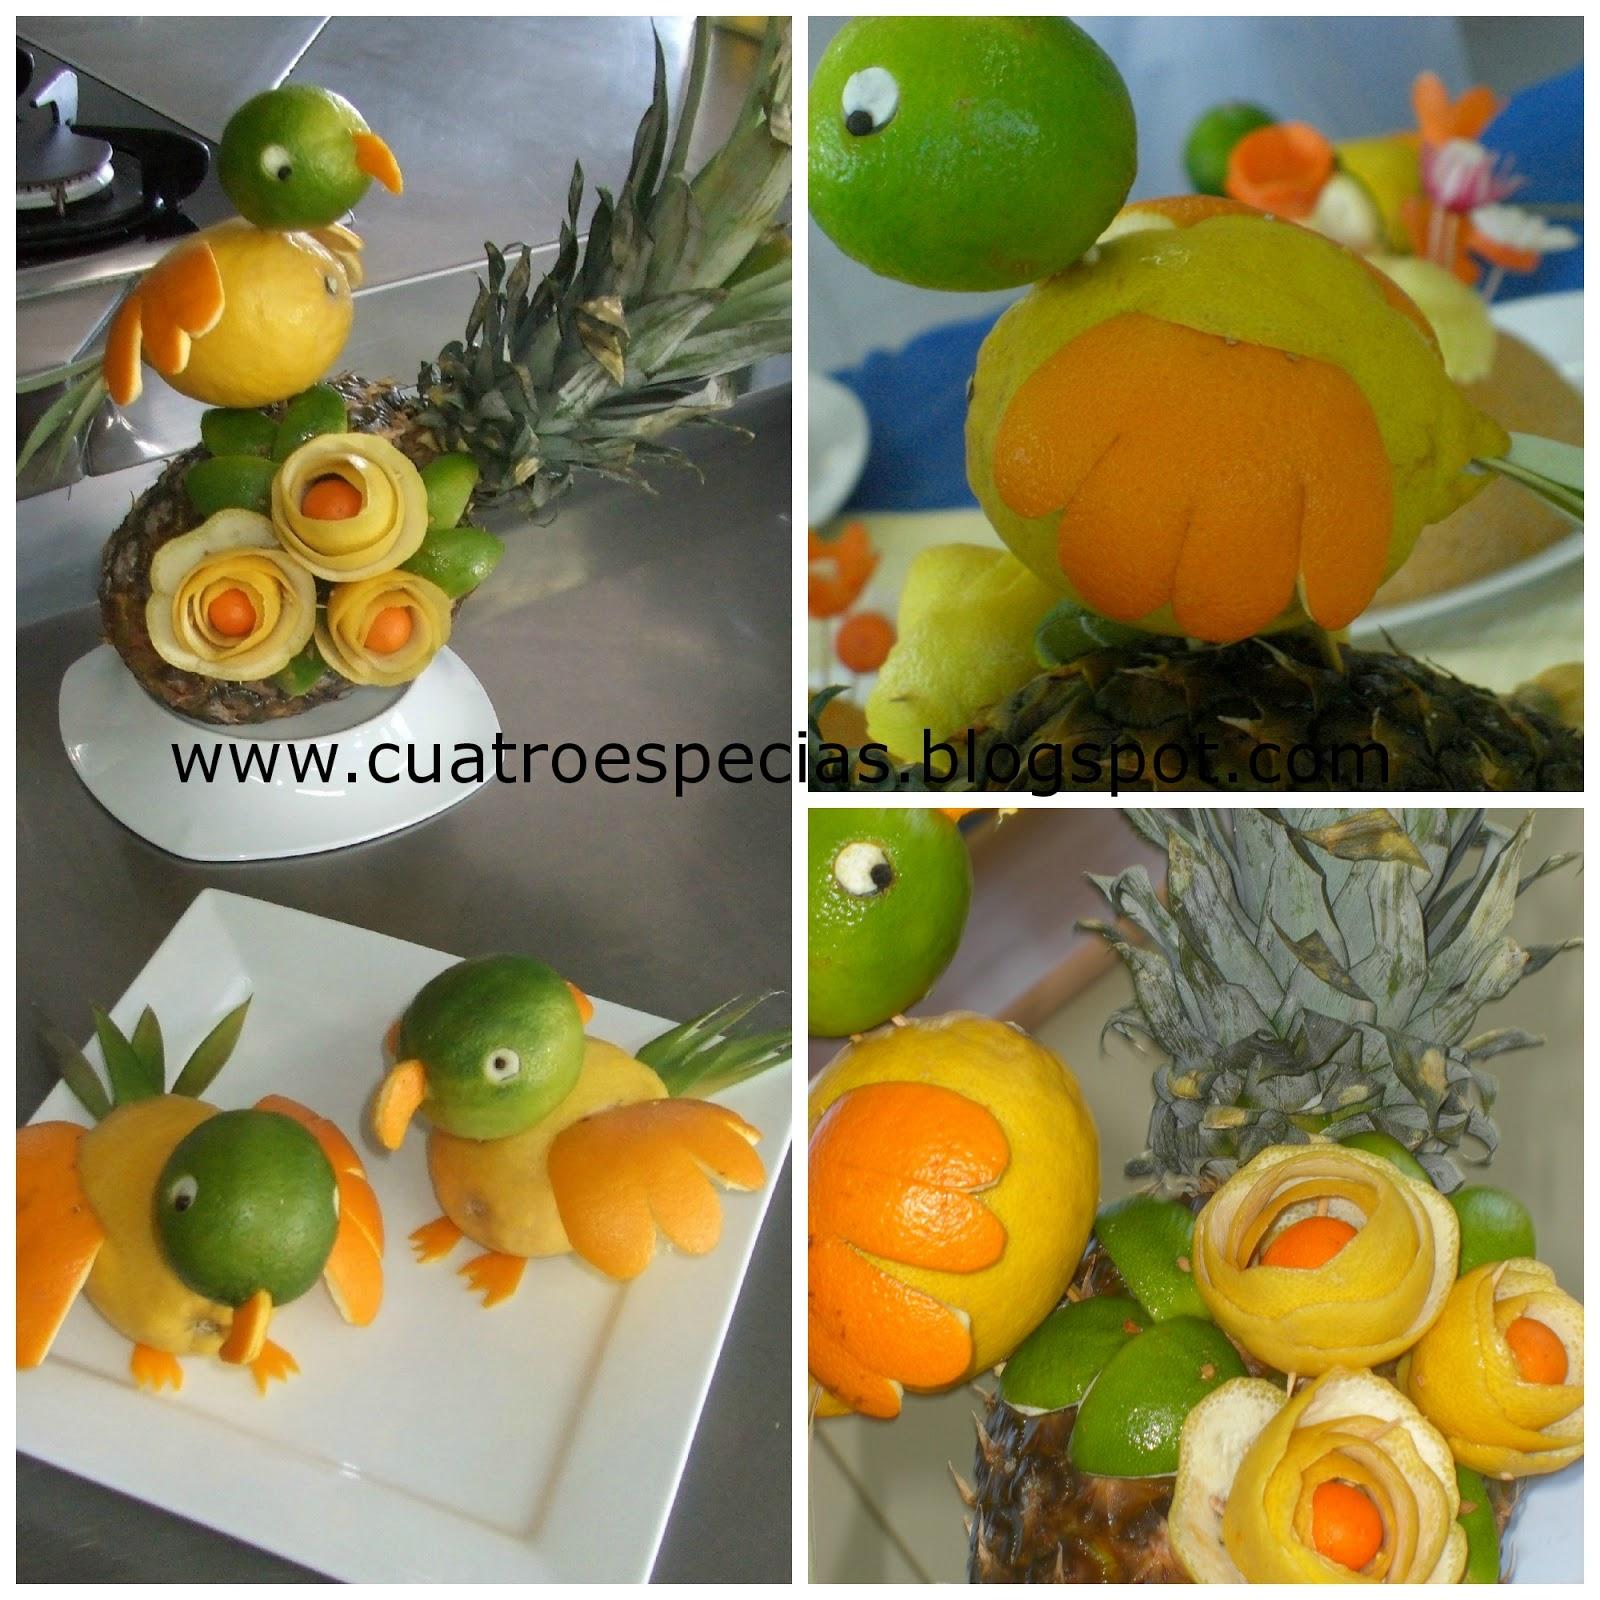 Pajaritos de fruta sabores de bolivia for Decoracion con verduras